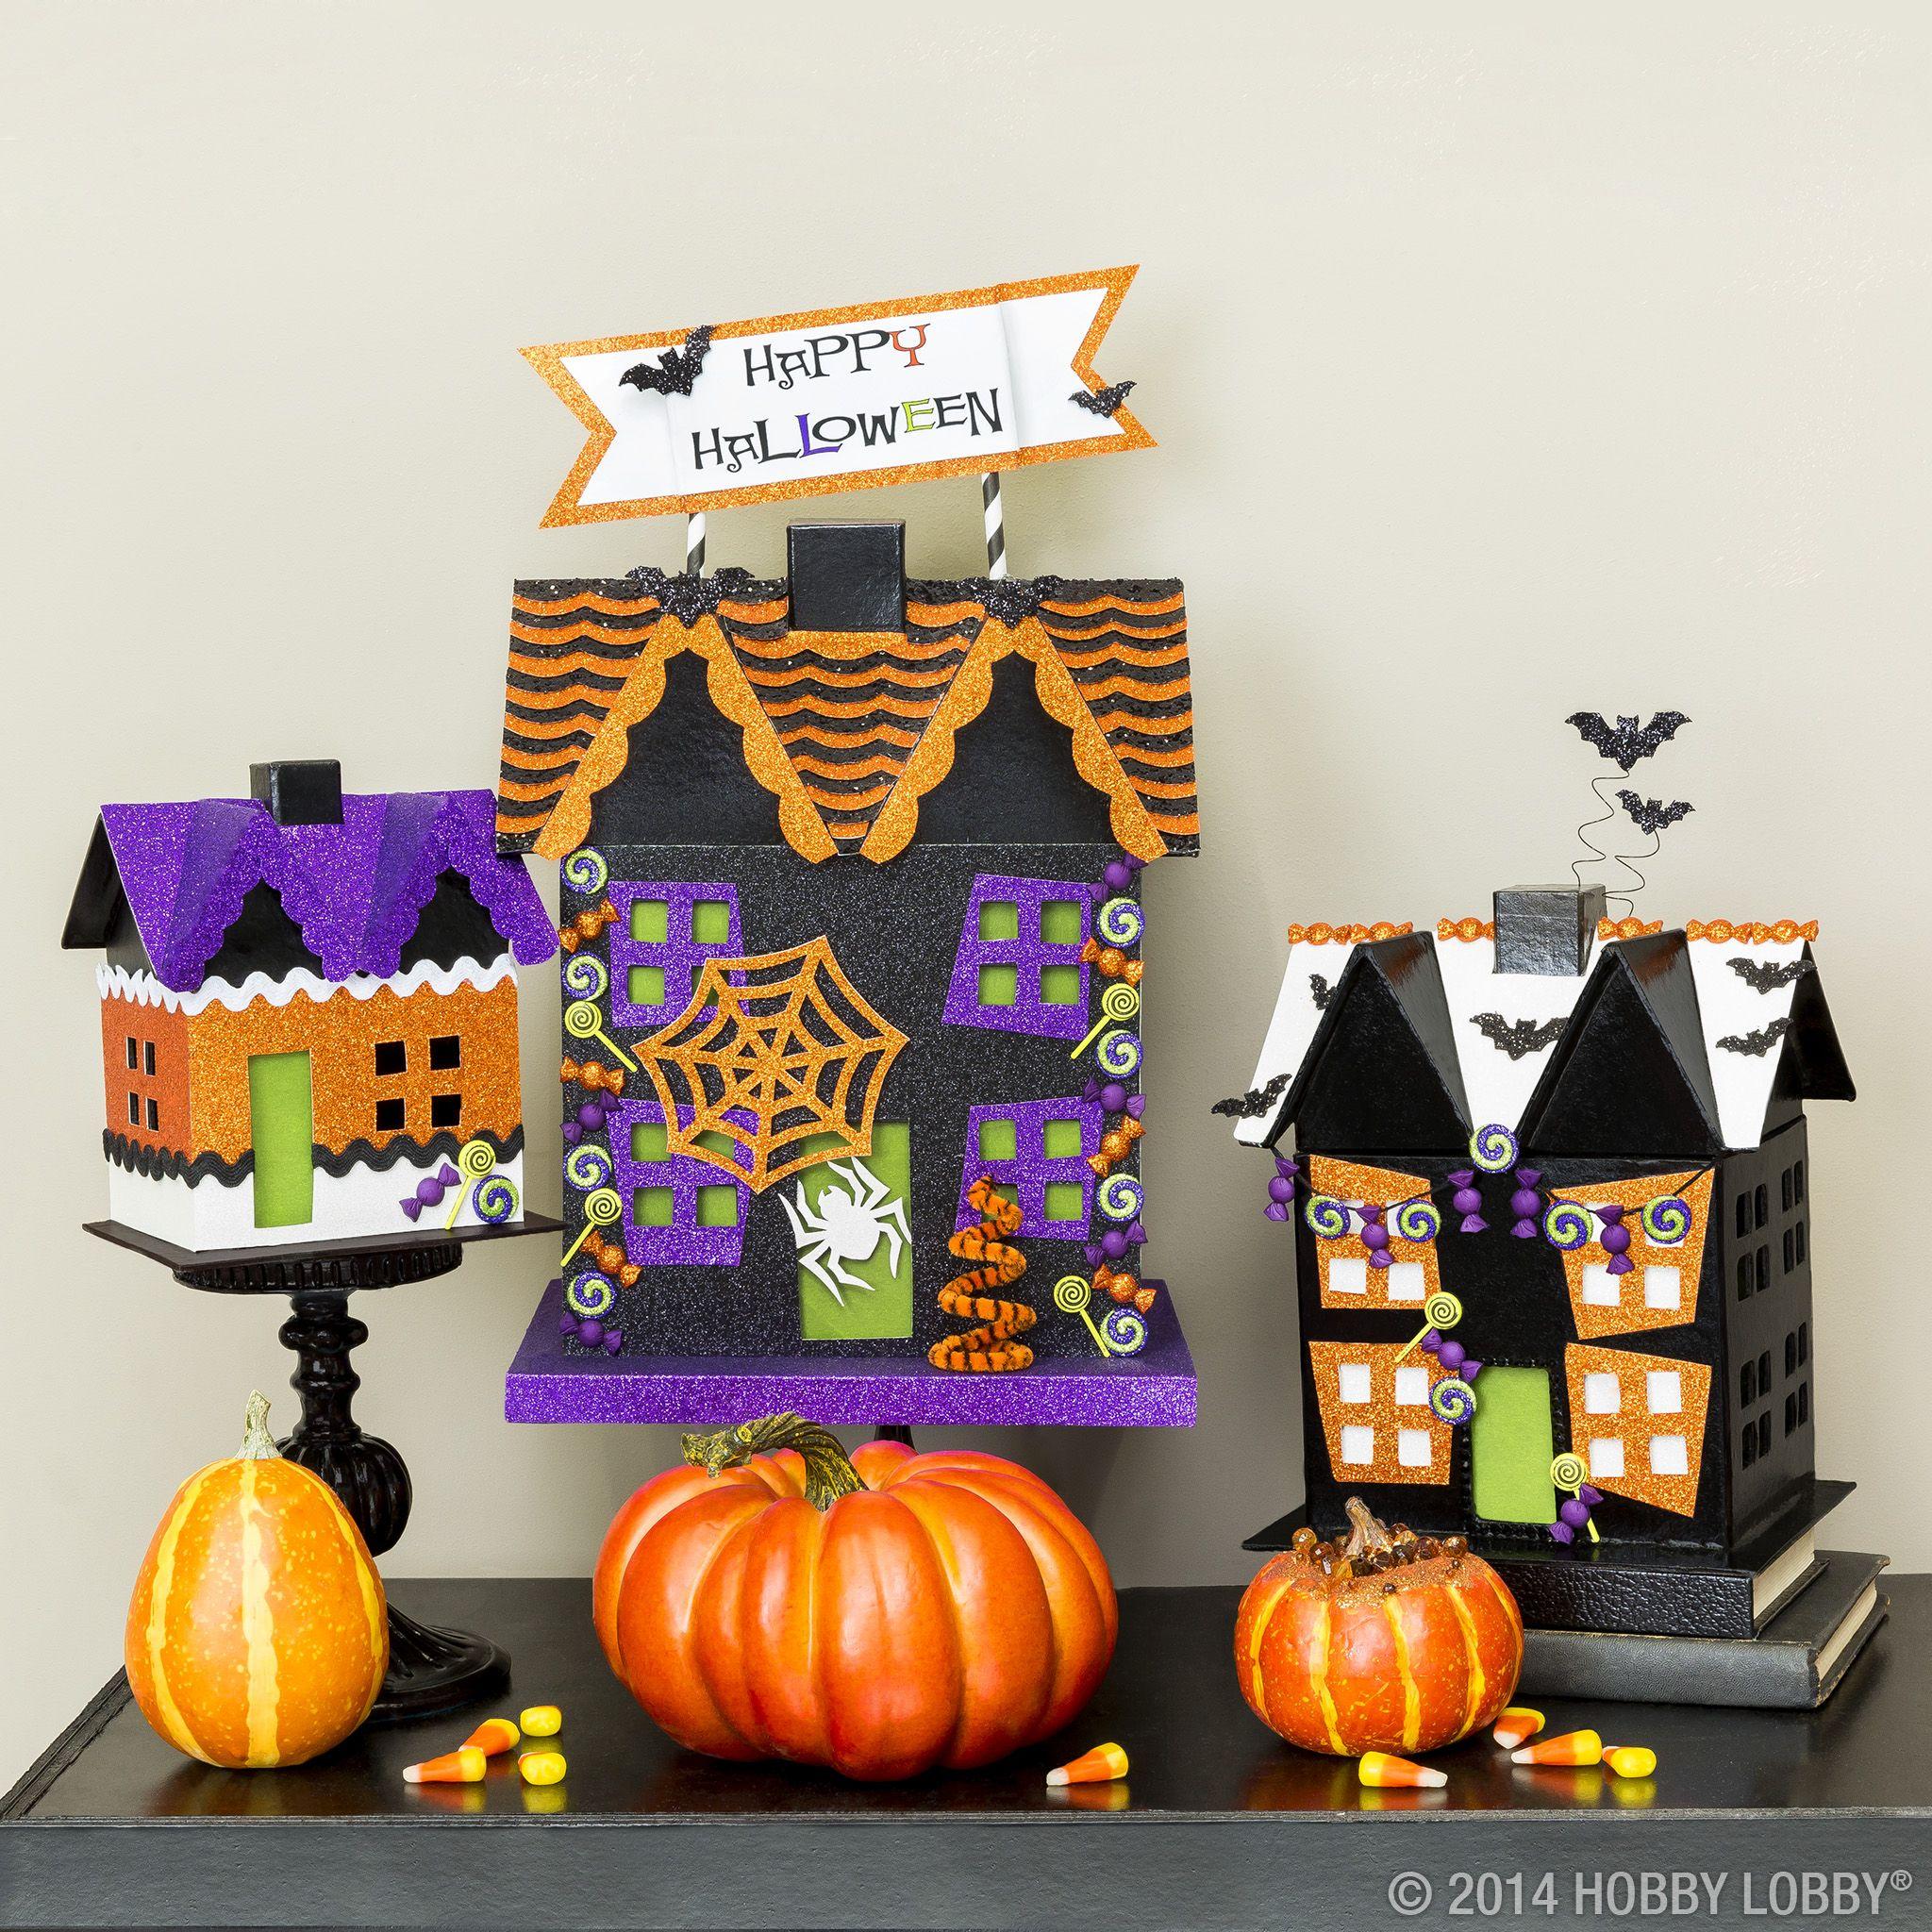 Paper Mache House Shape Set Shop Hobby Lobby Halloween Crafts Decorations Halloween Activities For Kids Art Craft Store